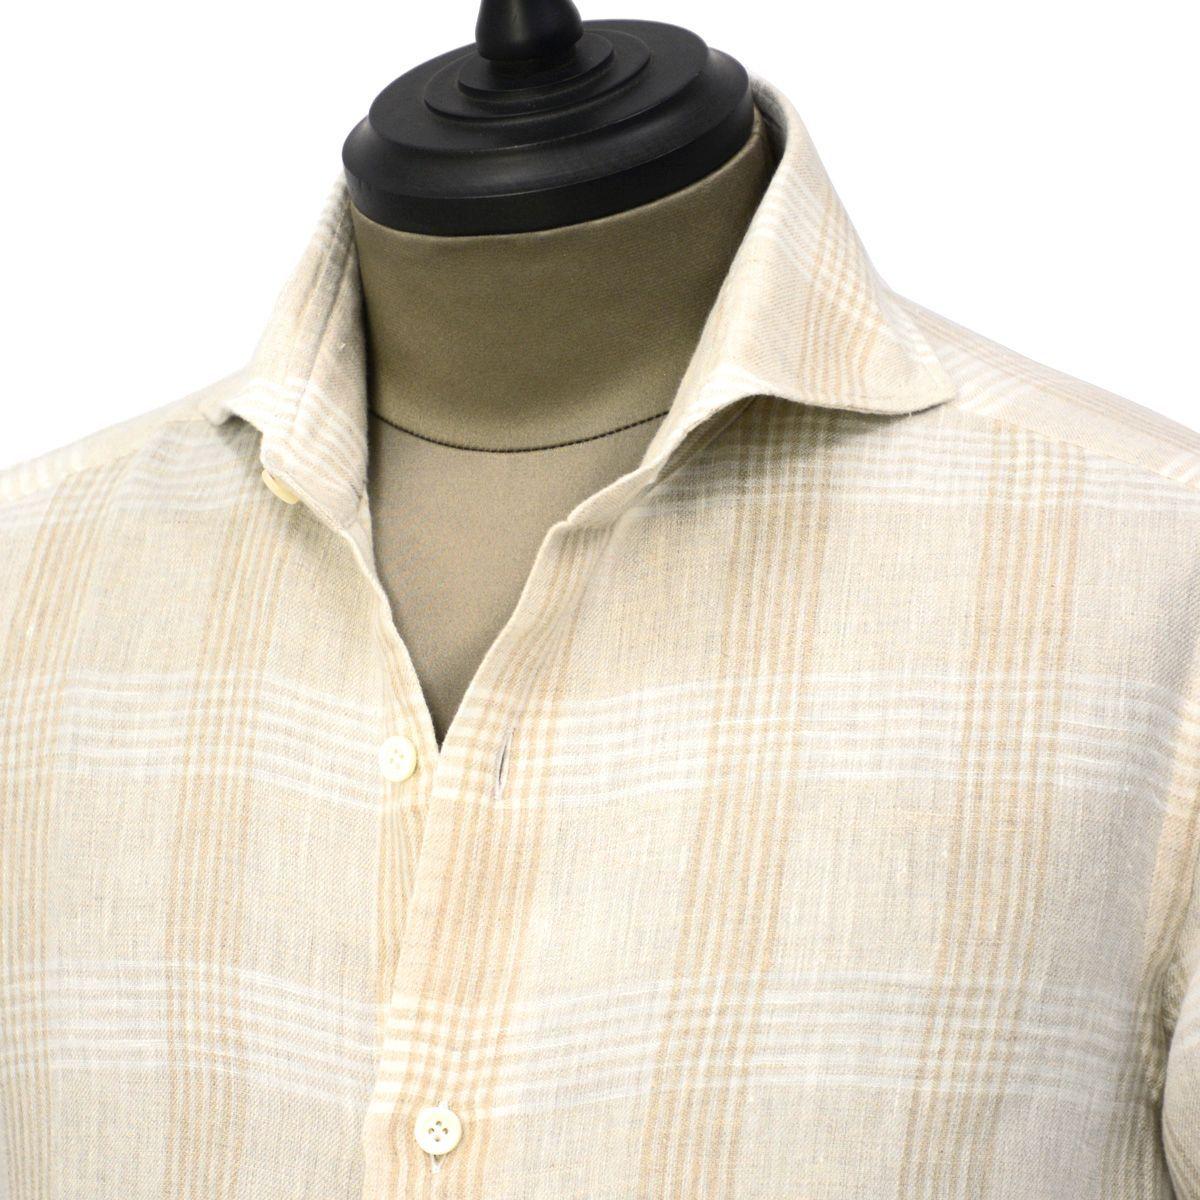 Giannetto【ジャンネット】カジュアルシャツ VINCI FIT AG88430V84 002 リネン チェック ベージュ